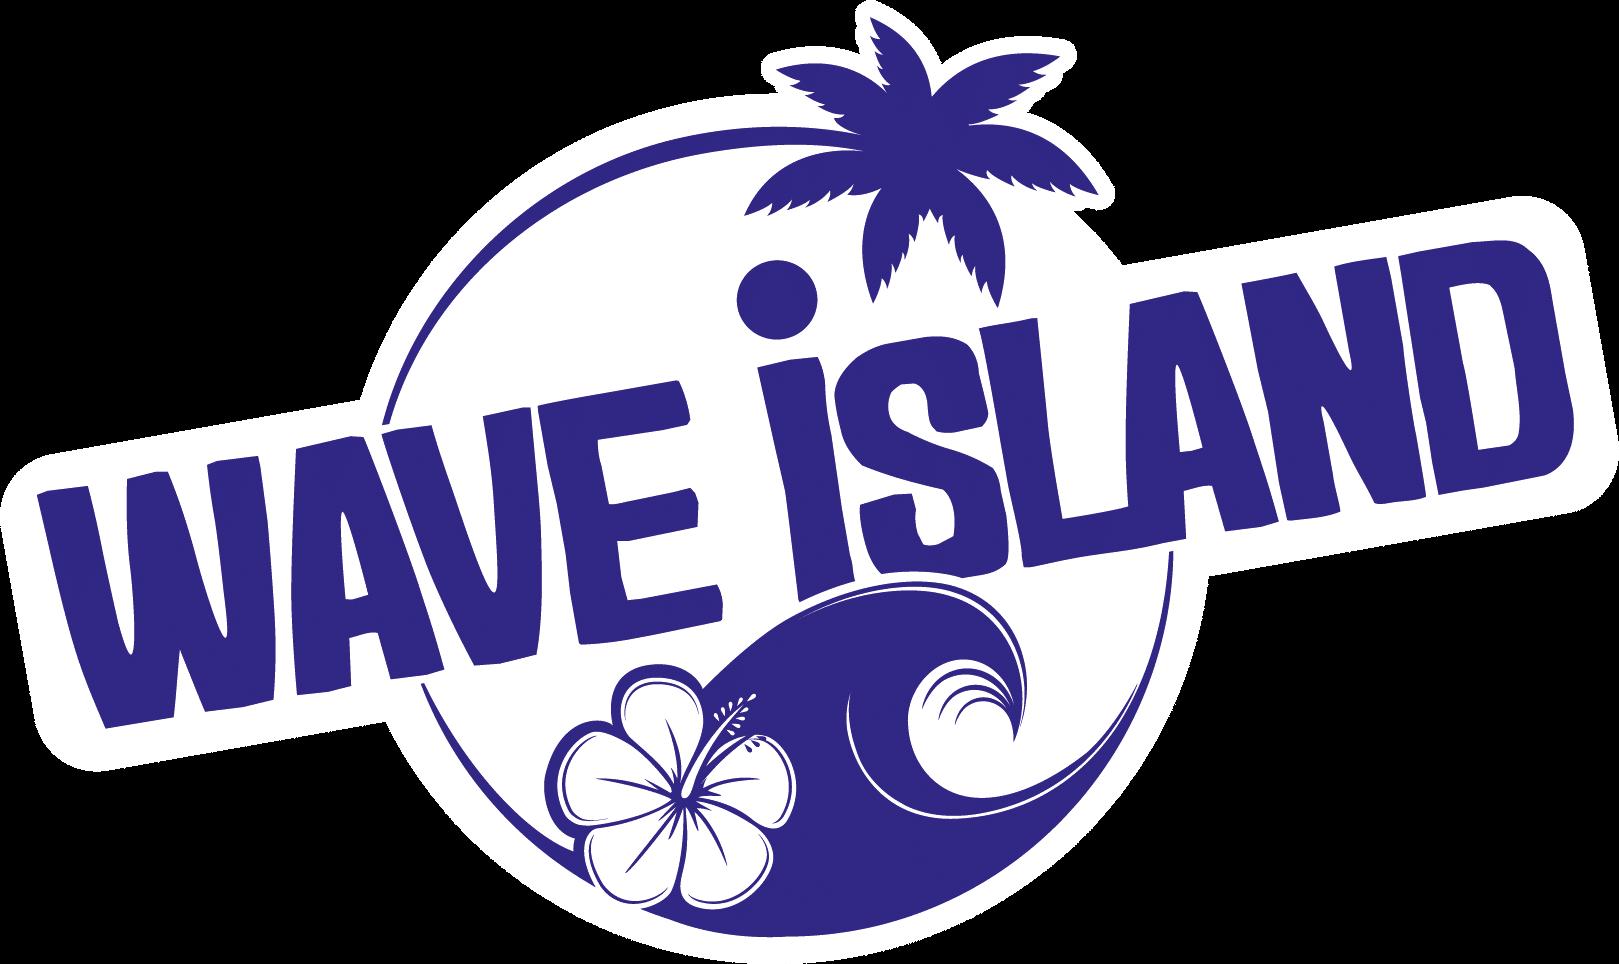 LOGO-WAVE-ISLAND-BLEU.png